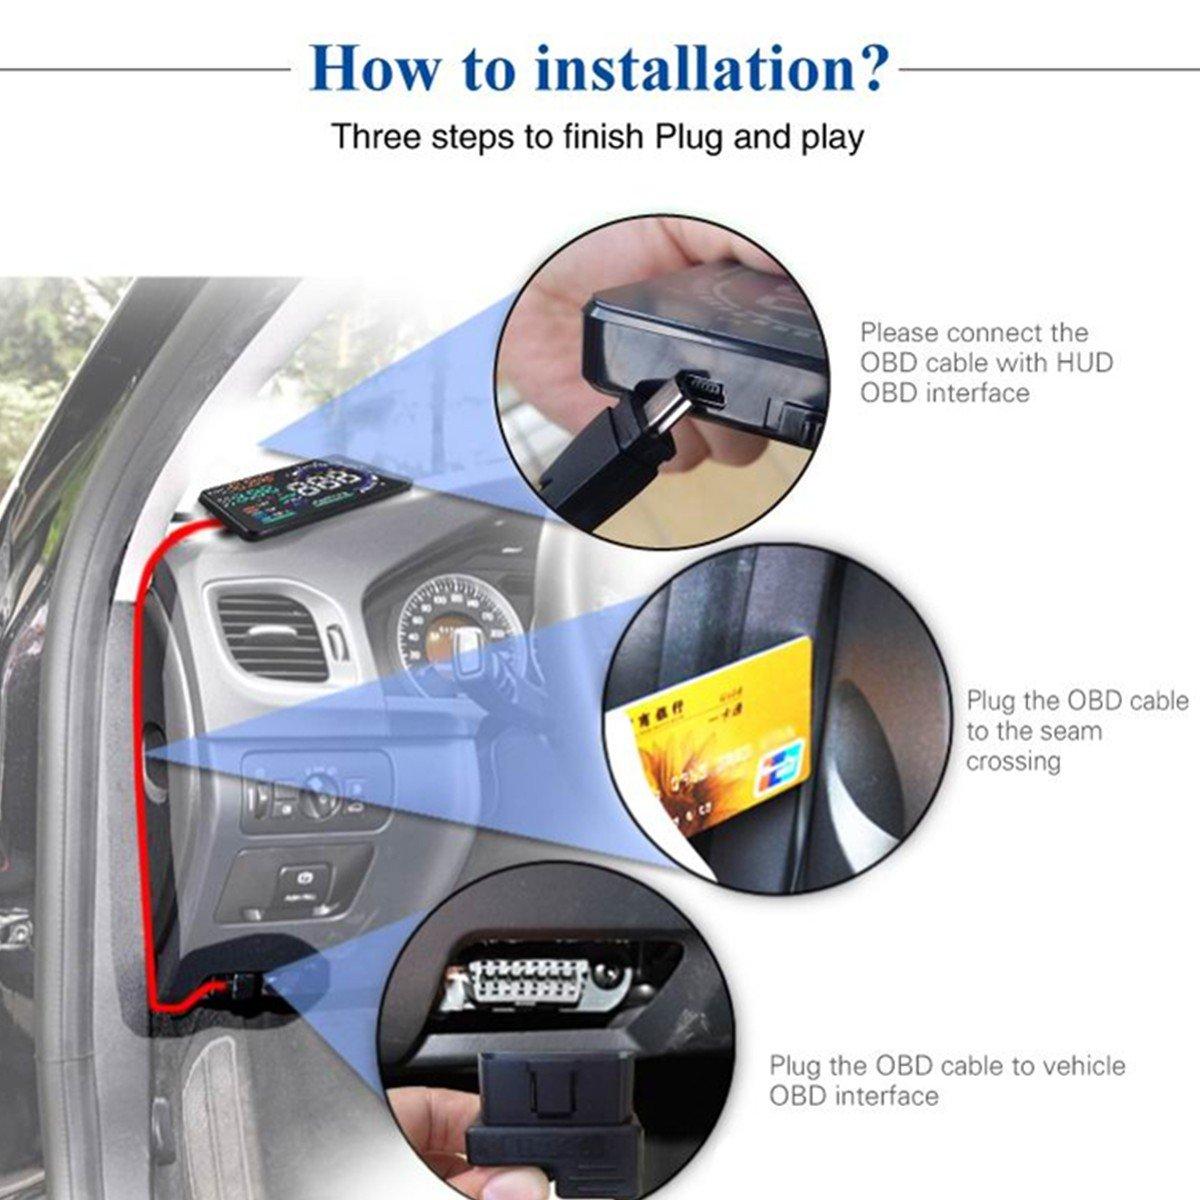 YICOTA 5.5 Original High Definition Car HUD Head-Up Display Advanced Windshield LED Projector Fit for OBD II EOBD System Model Cars A8 EA1863